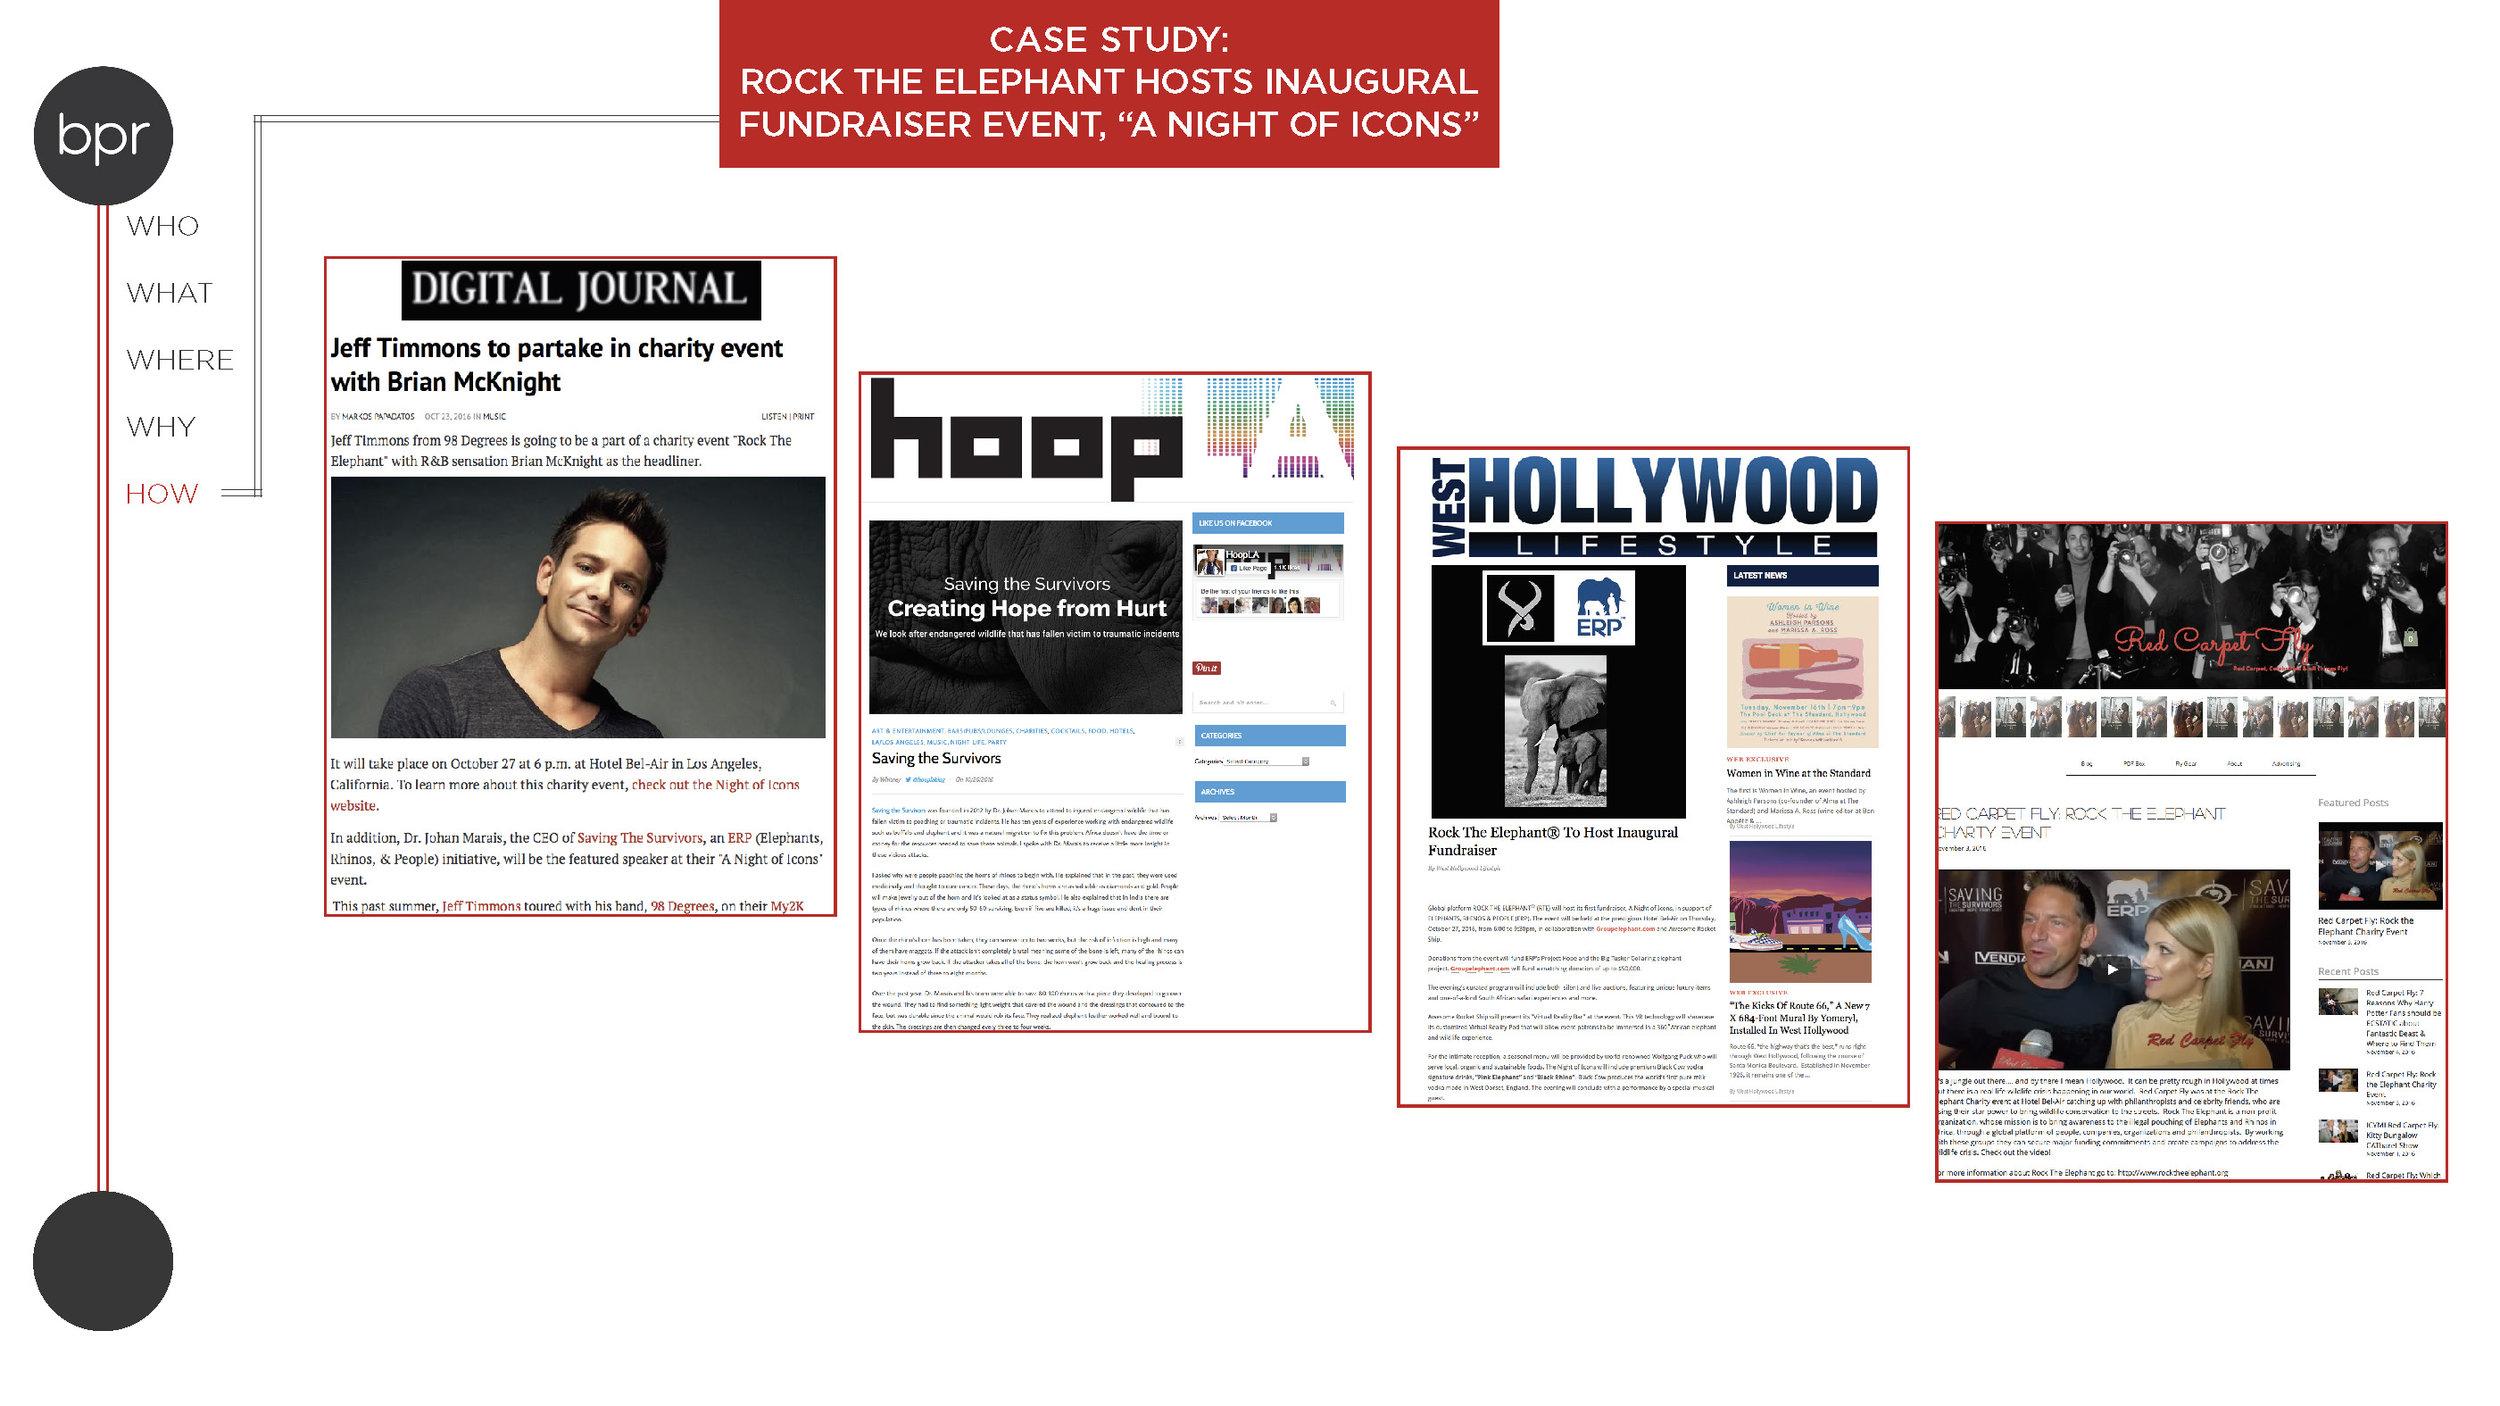 Rock The Elephant Case Study_Page_4.jpg